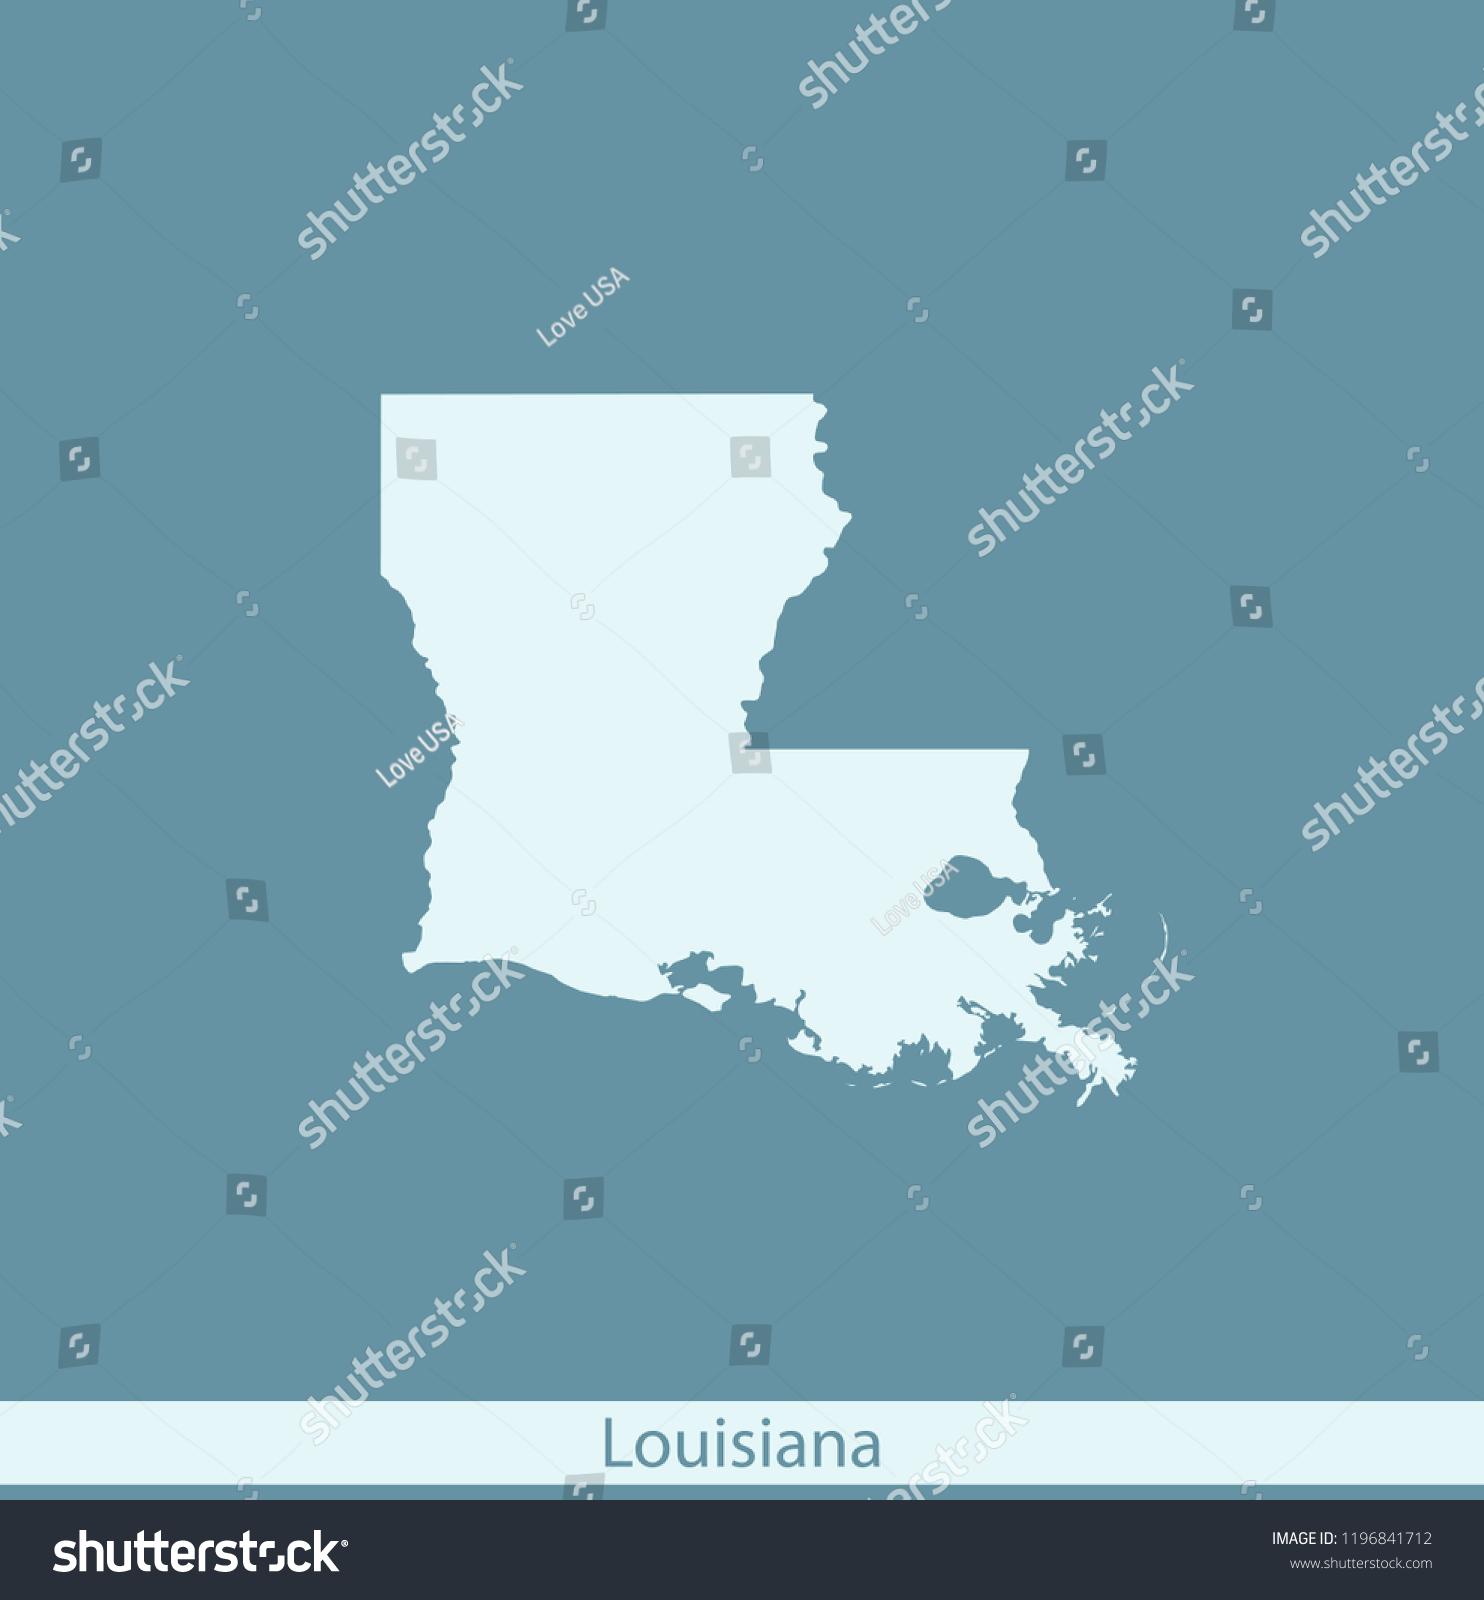 Vector Map Louisiana Stock-Vrgrafik (Lizenzfrei) 1196841712 ... on